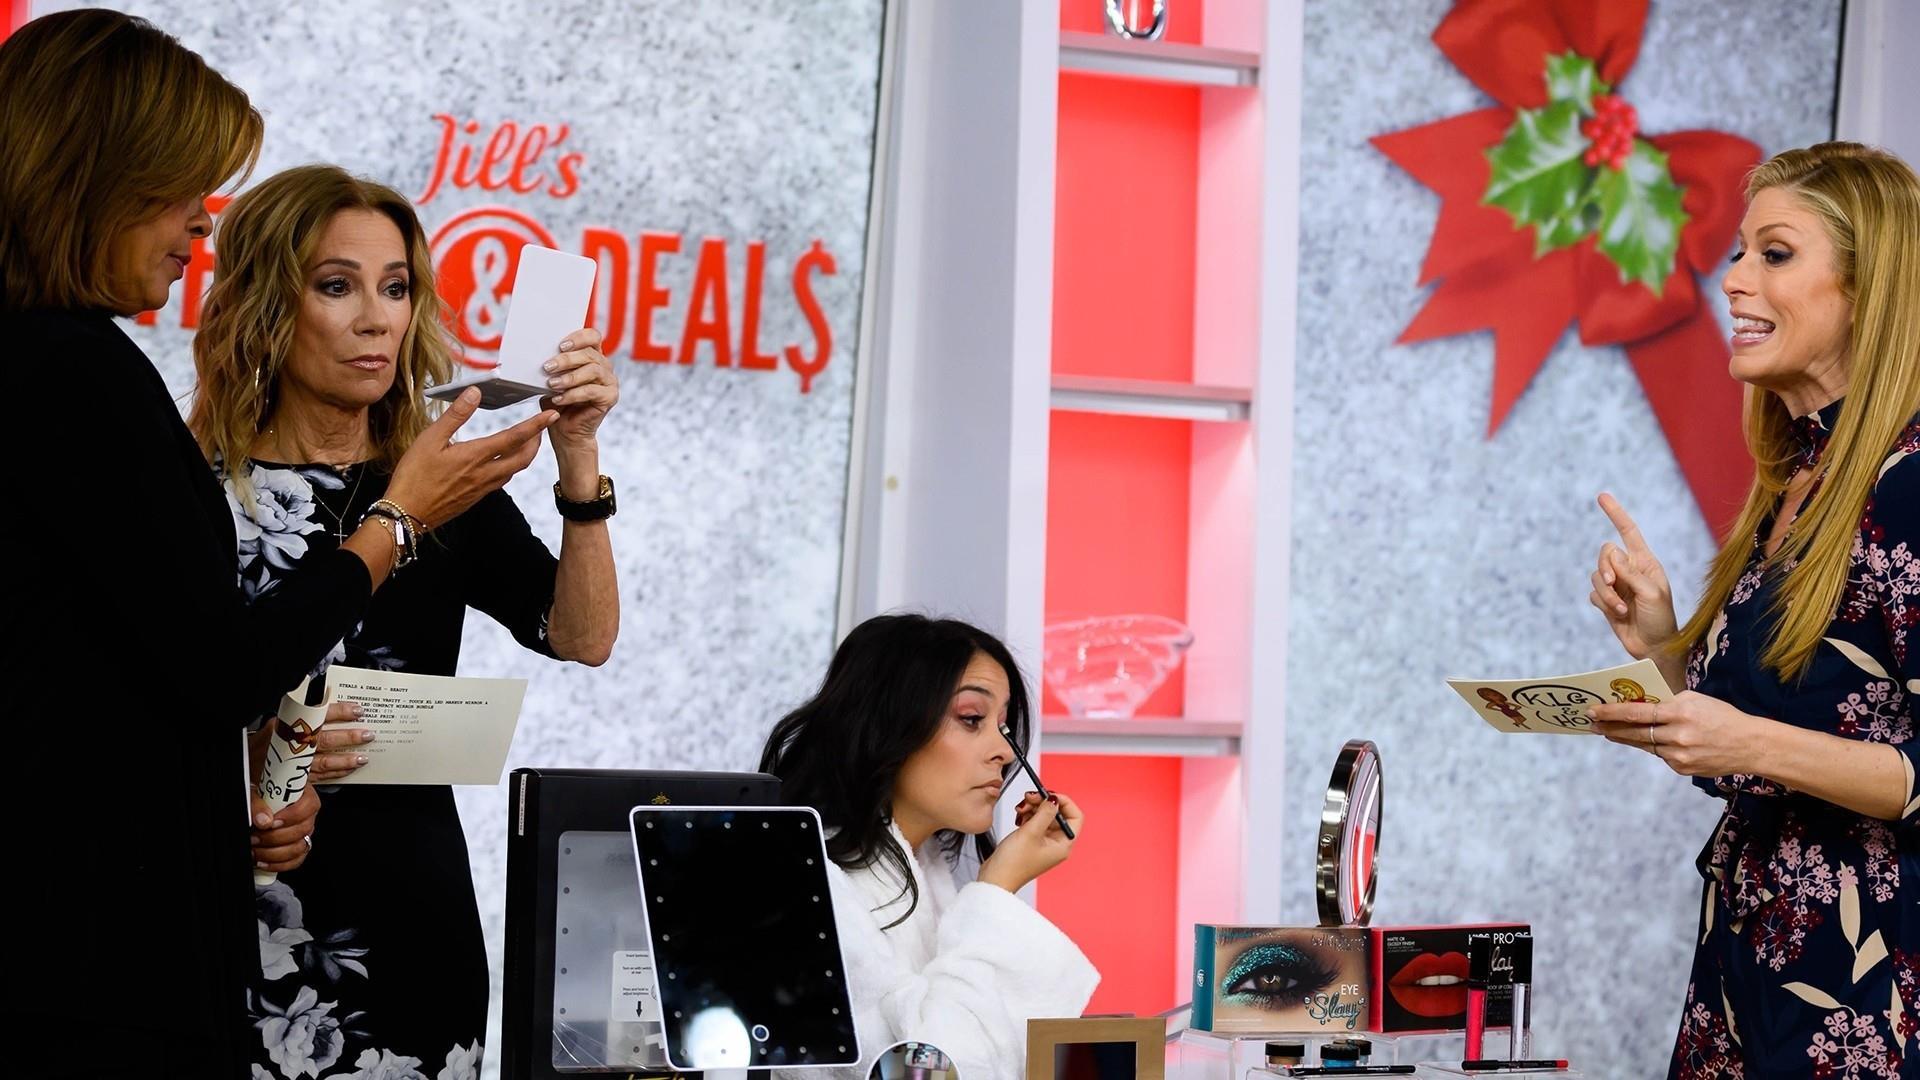 Jill S Steals And Deals For Beauty Vanity Set Nail Polish More